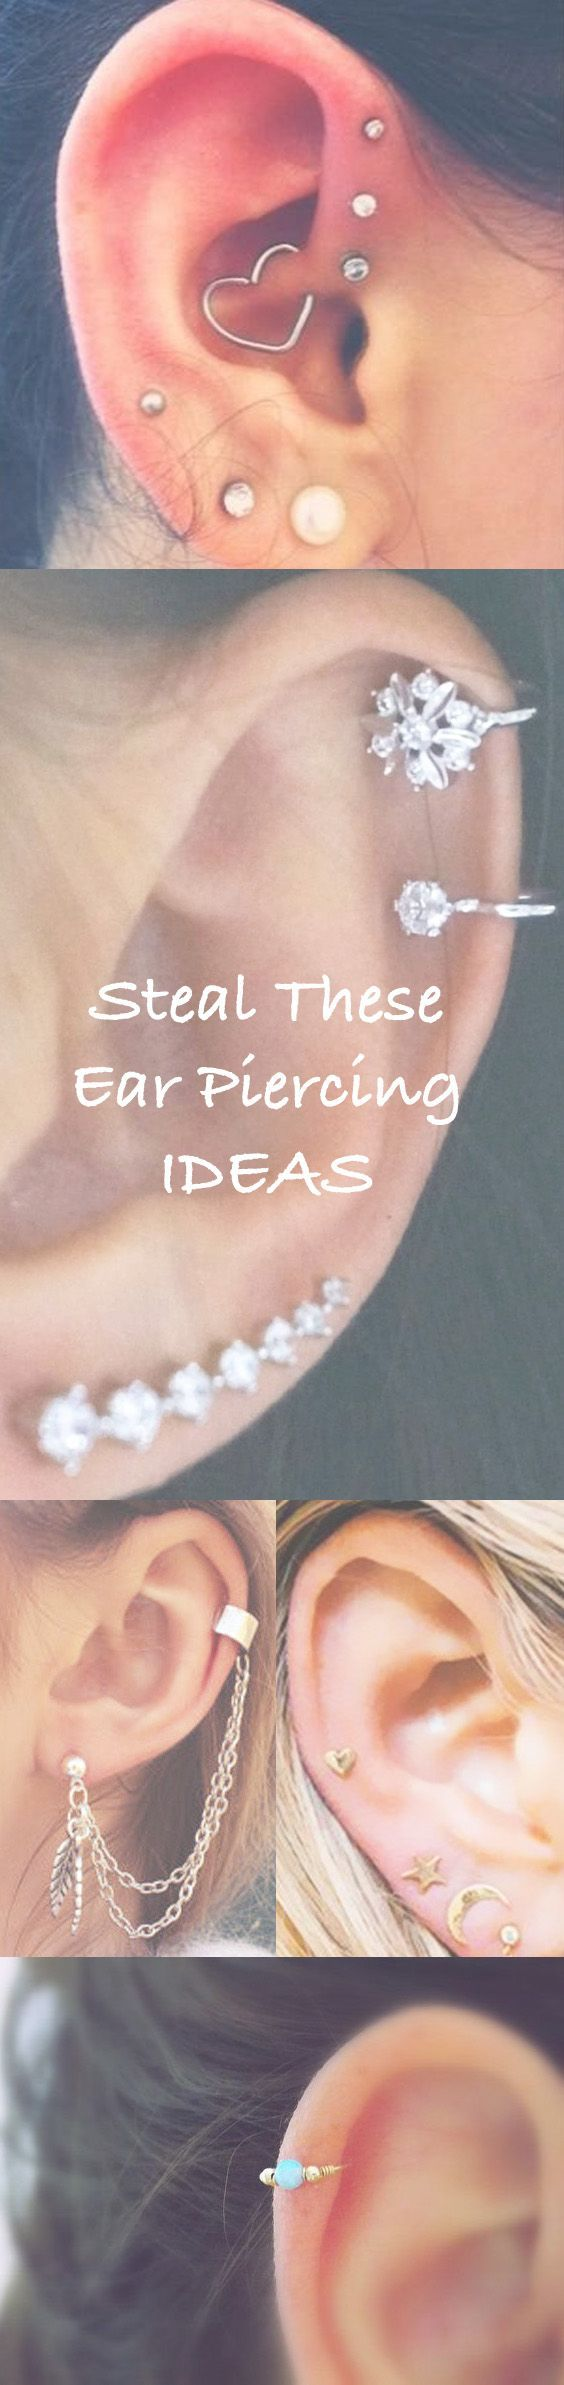 Cute piercing ideas ears  Cute Ear Piercing Ideas at MyBodiArt  Cartilage Tragus Helix